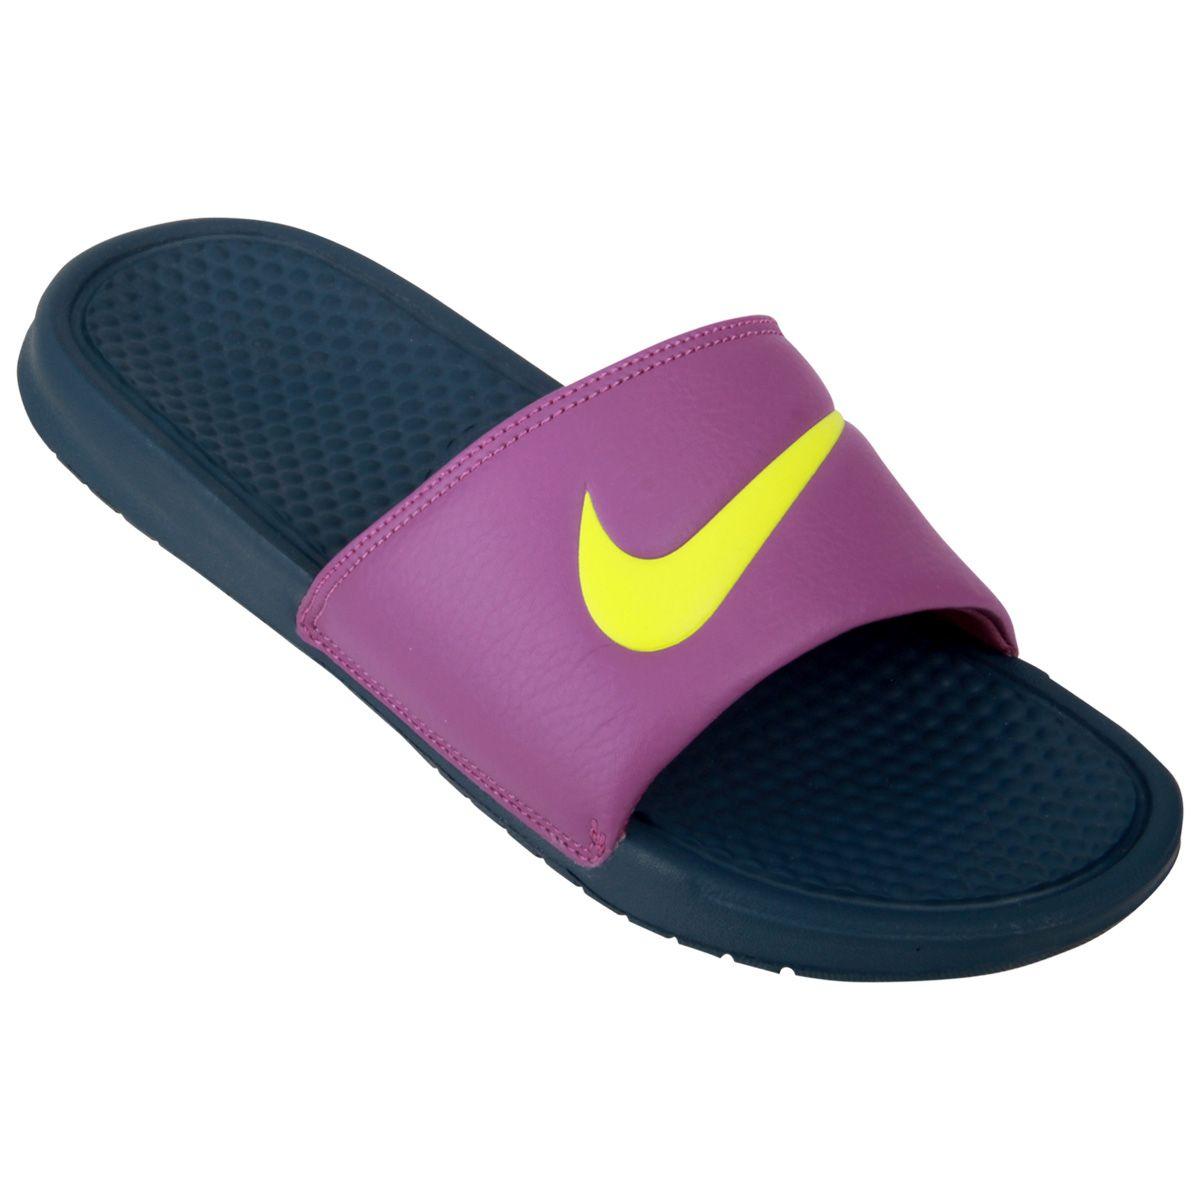 Benassi Benassi Nike Nike Swoosh Ojotas Swoosh Ojotas Netshoes309Sandalias I6gvbyfY7